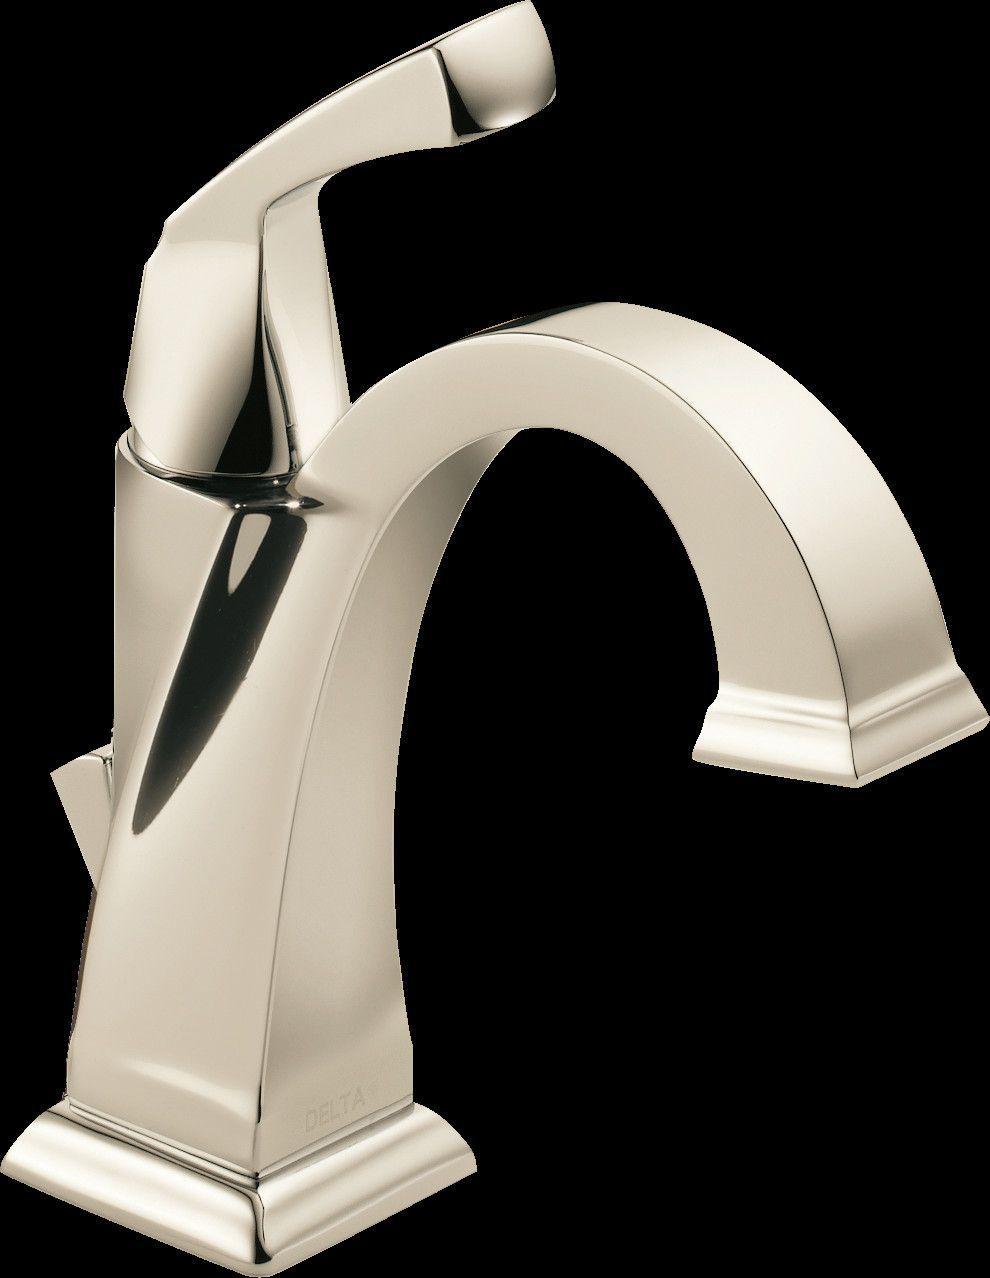 Dryden Single Hole Bathroom Faucet With Diamond Seal